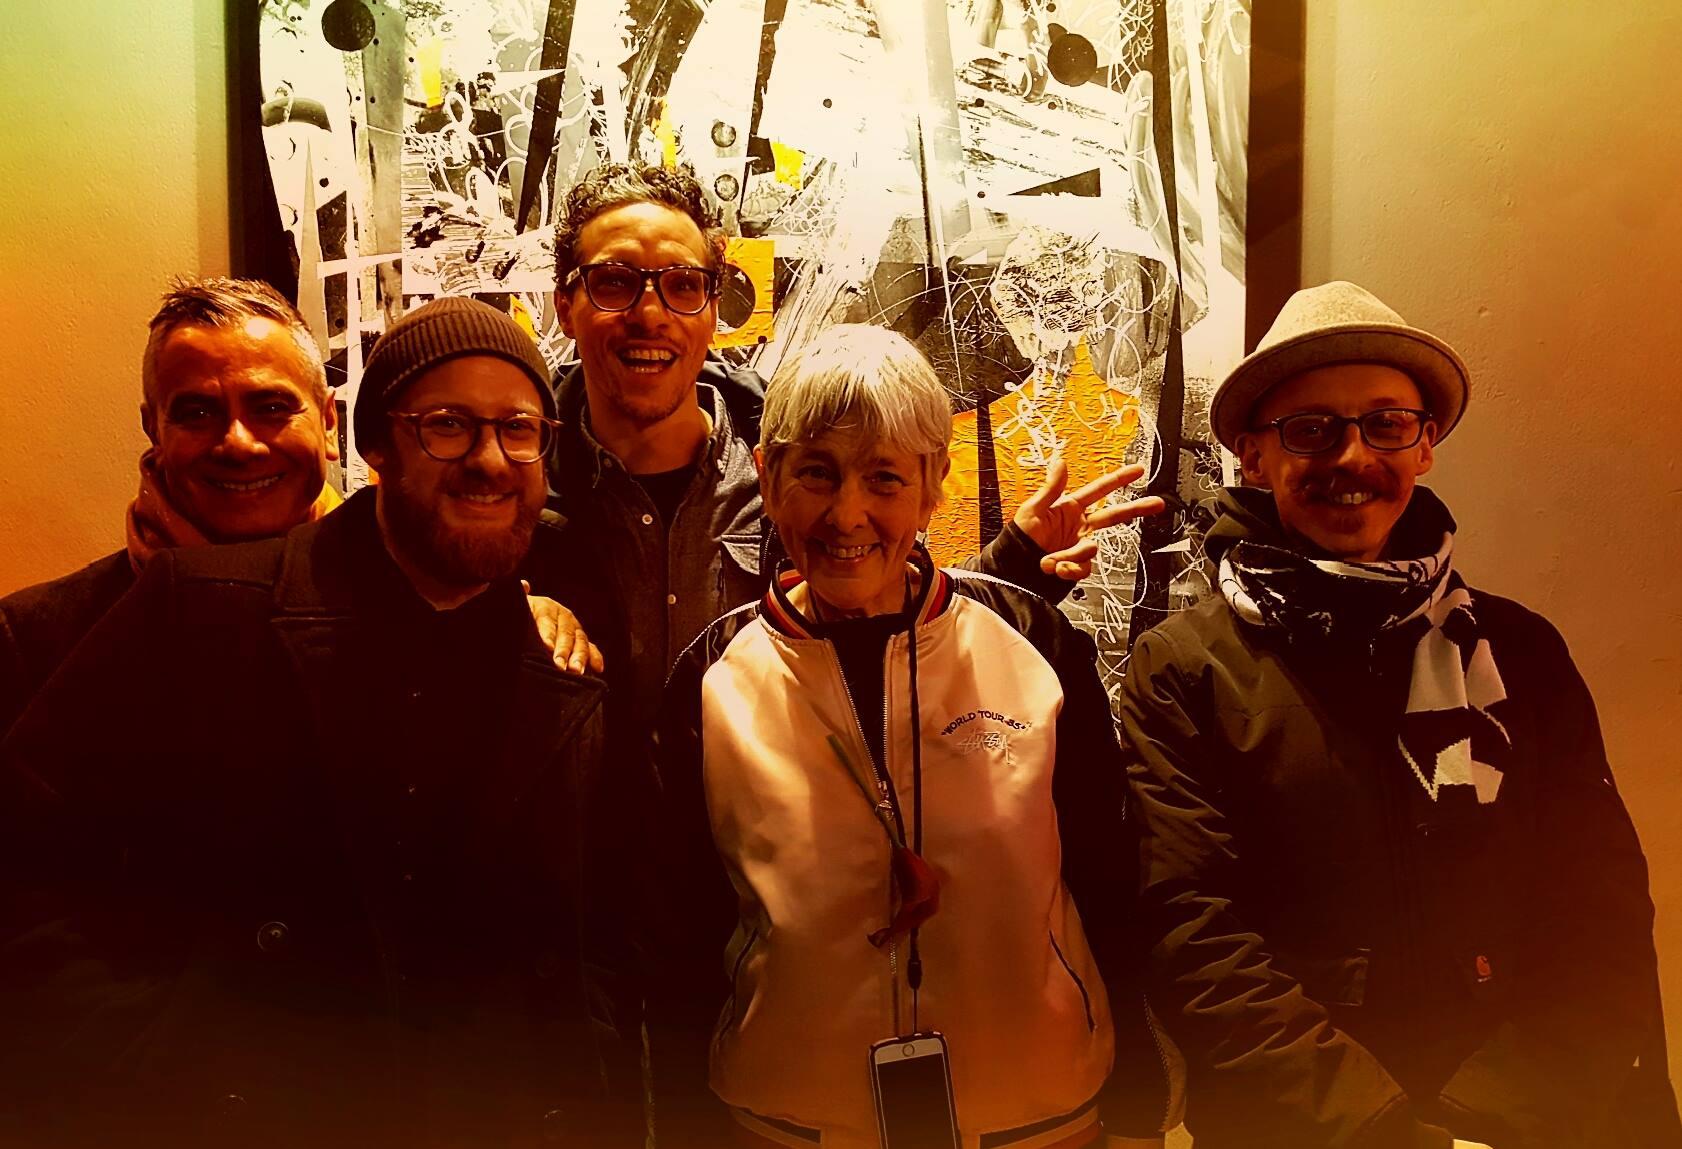 Full flush: Jamie Rojo from Brookly Street Art, Patrick Hartl, C100, Martha Cooper and Dave the Chimp